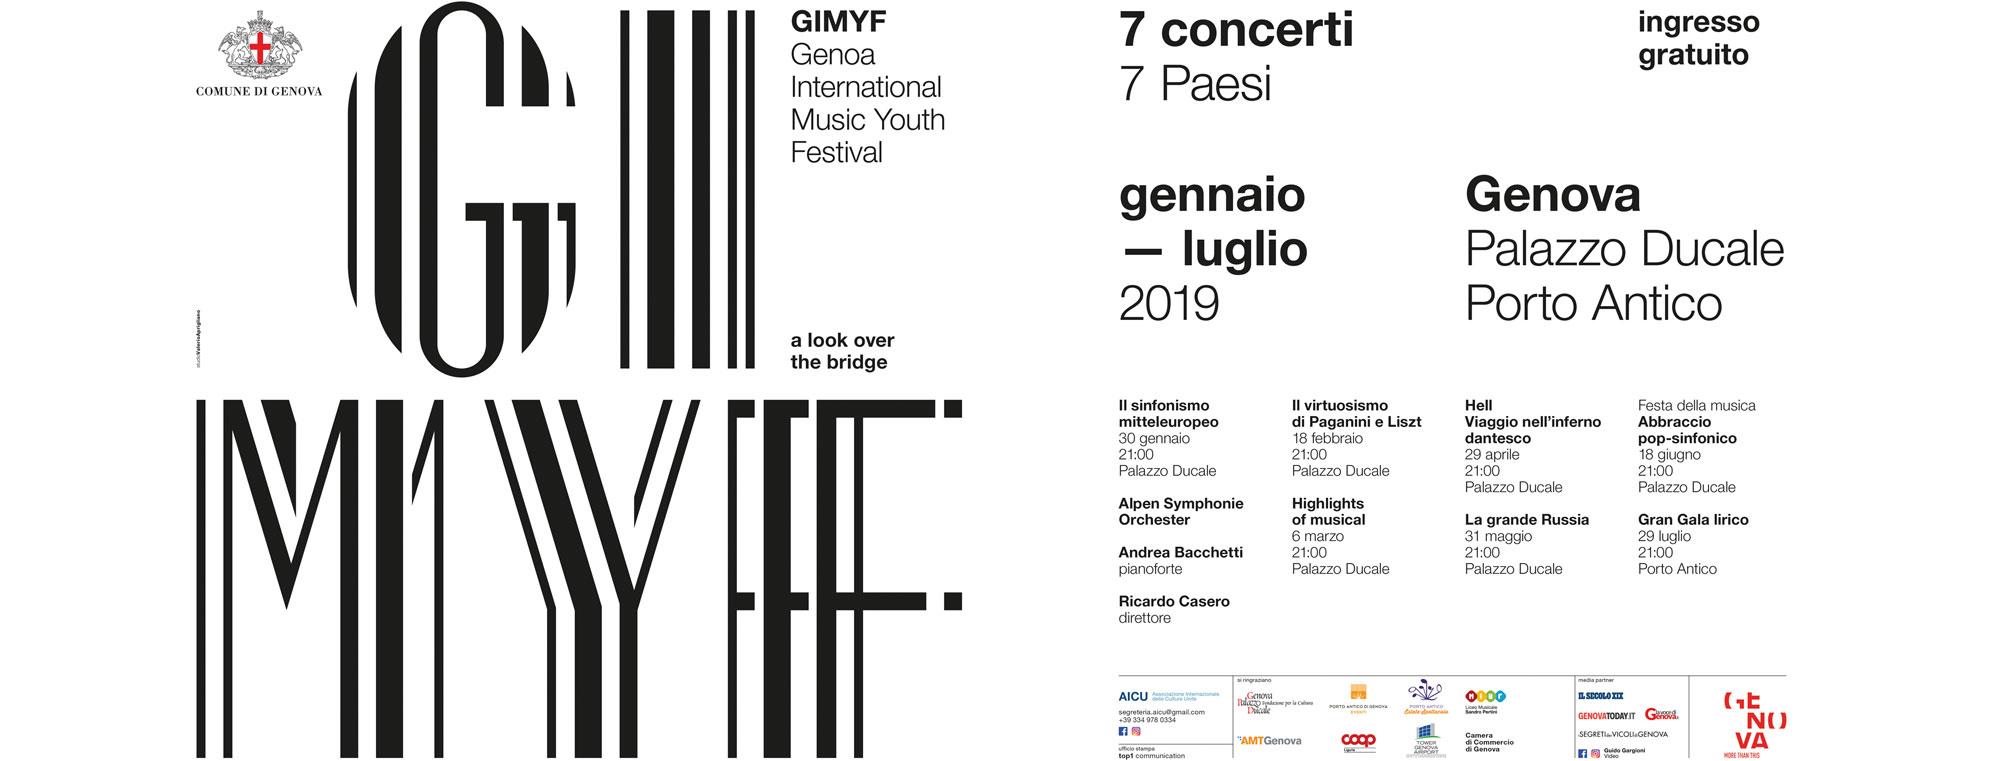 Unite Genova Calendario.Genoa International Music Youth Festival Da Gennaio A